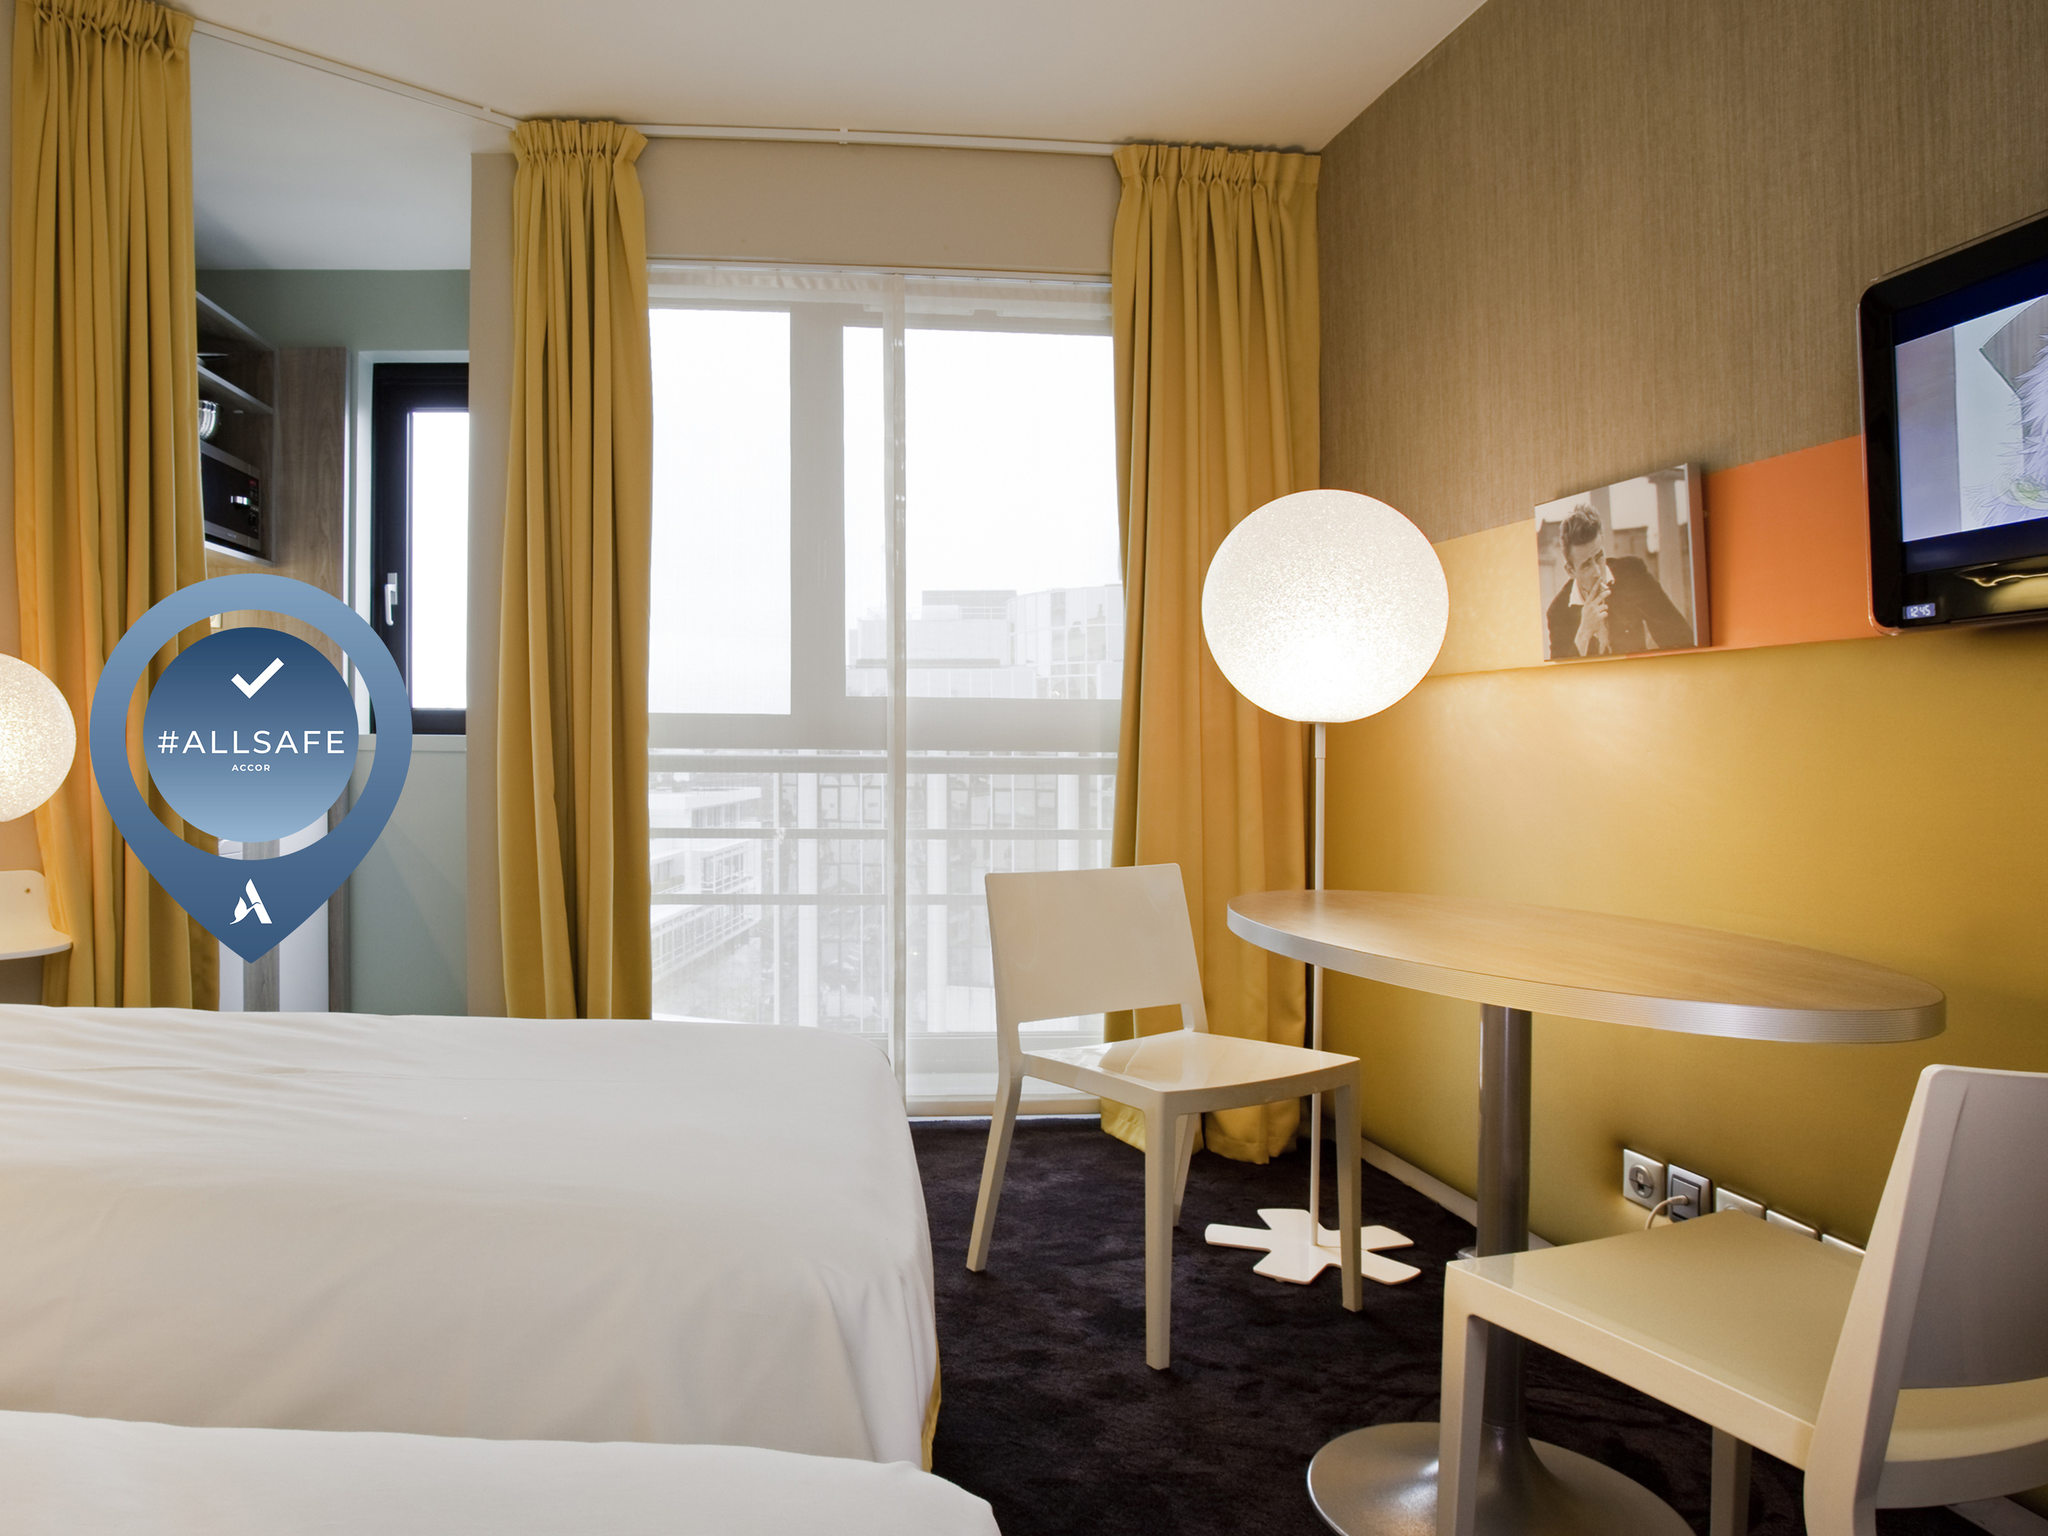 Hotell – Apparthotel Mercure Paris Boulogne